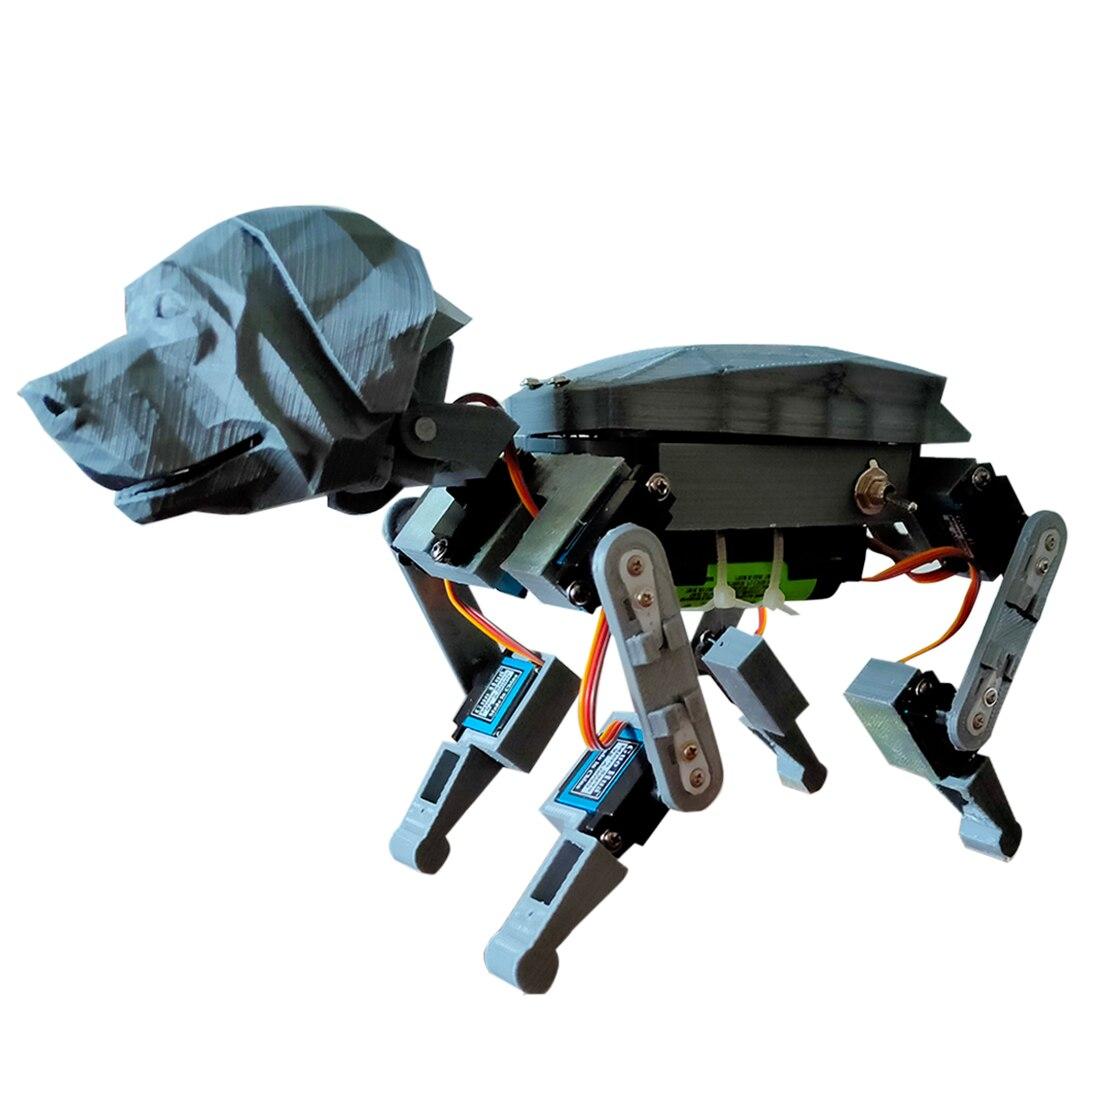 Programmable Mechanical Cat 11DOF Bionic Quadruped Crawling Robot Toy